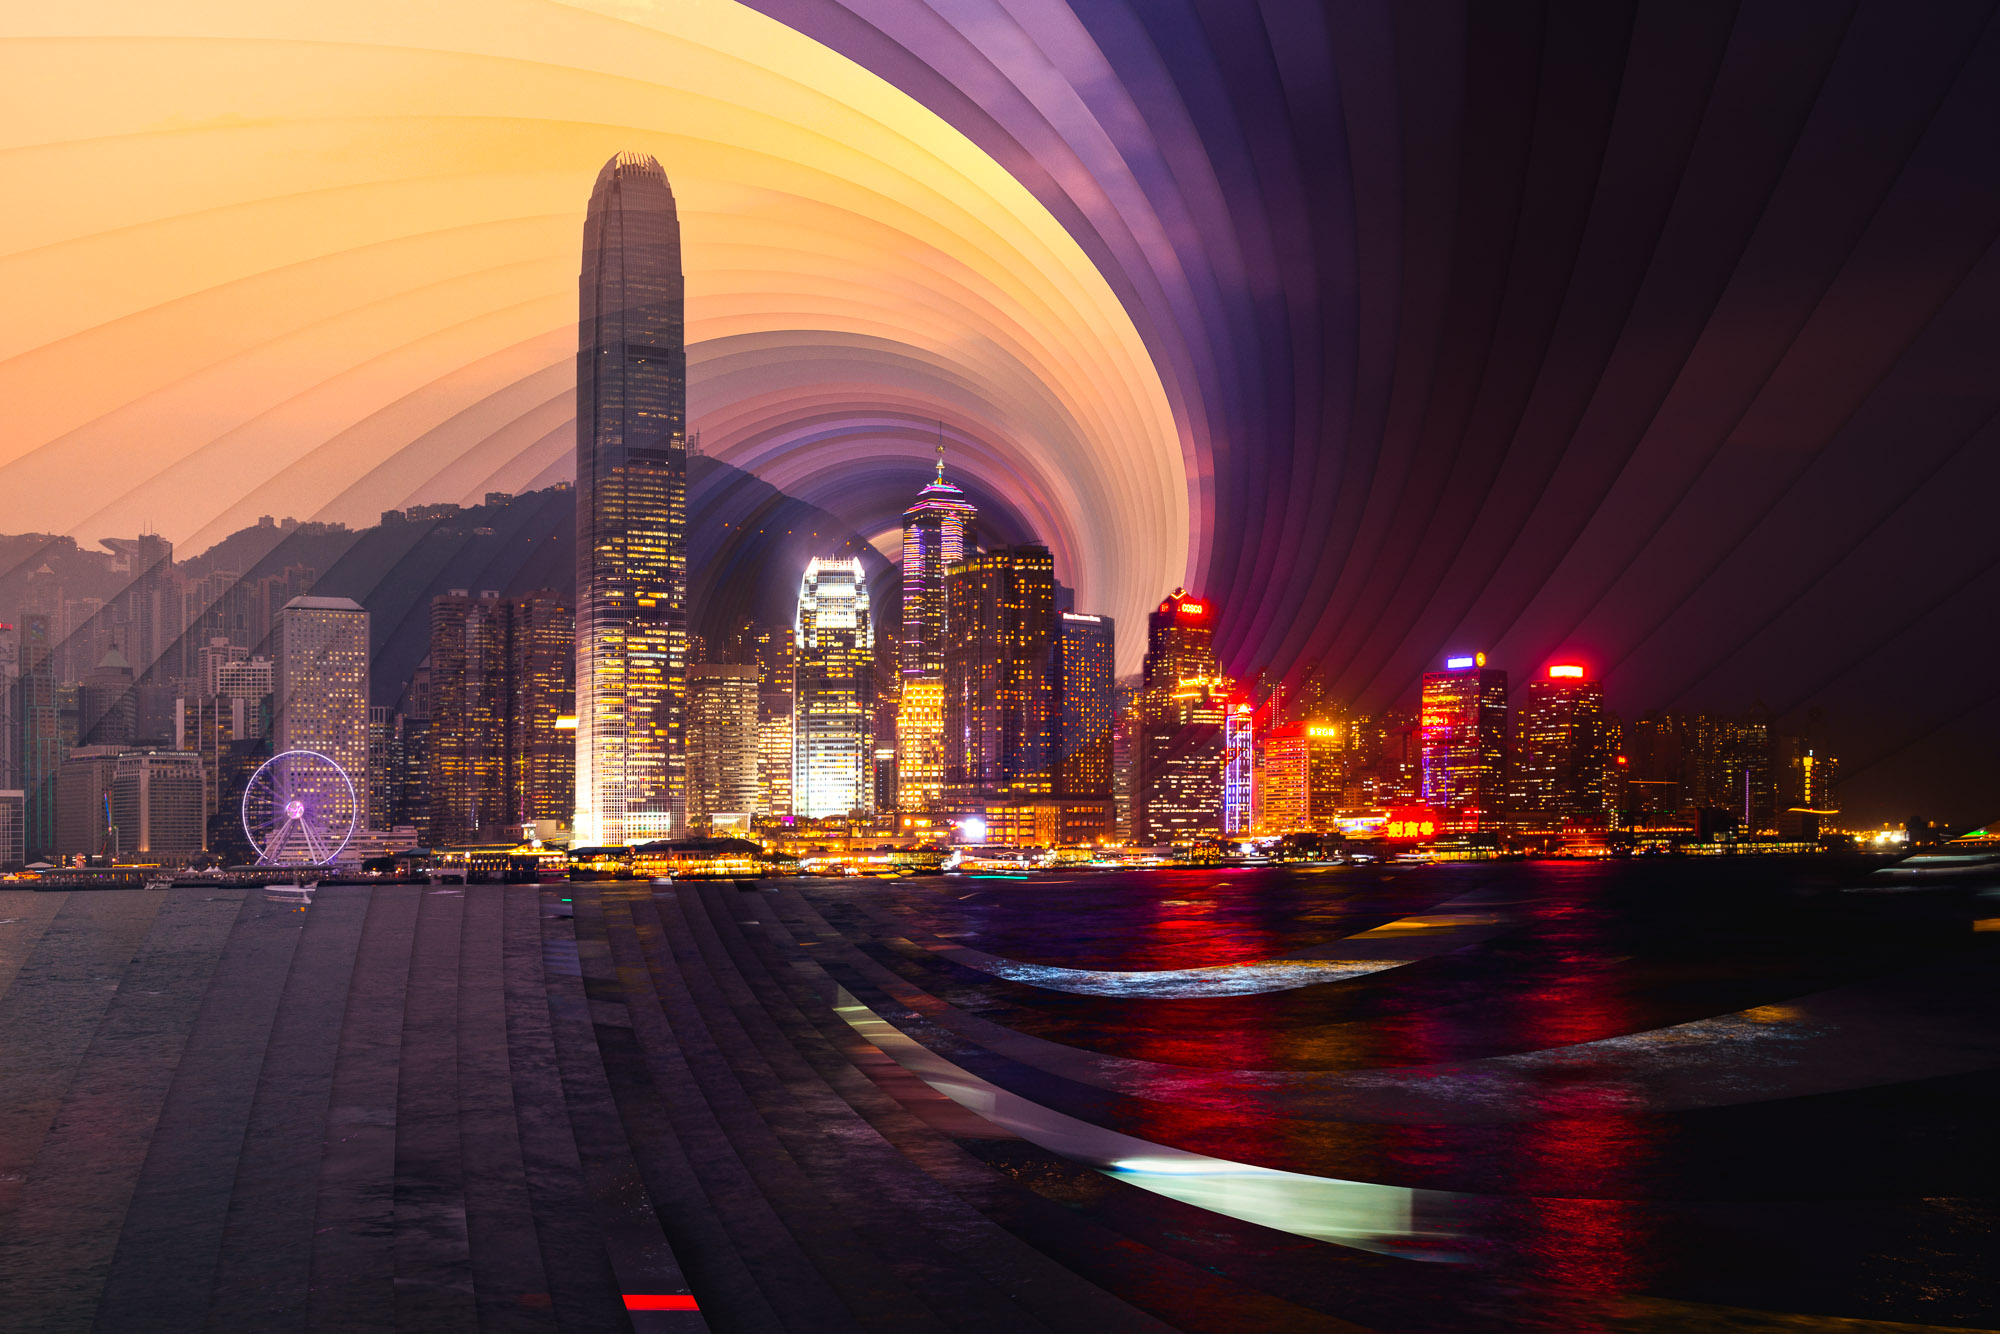 Timeslice Hong Kong in 50 photos